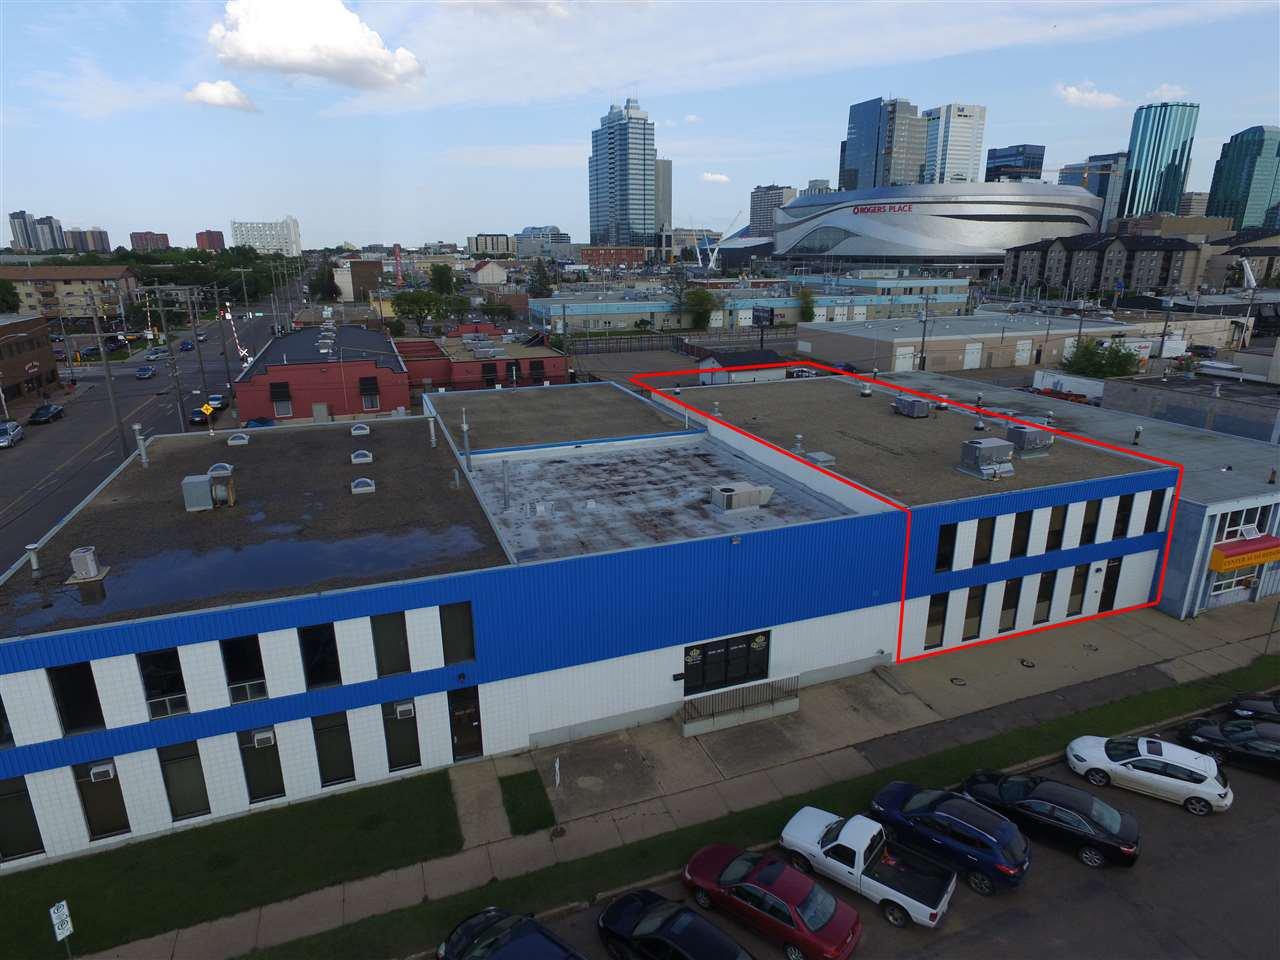 Main Photo: 10575 106 Street in Edmonton: Zone 08 Industrial for lease : MLS®# E4212691